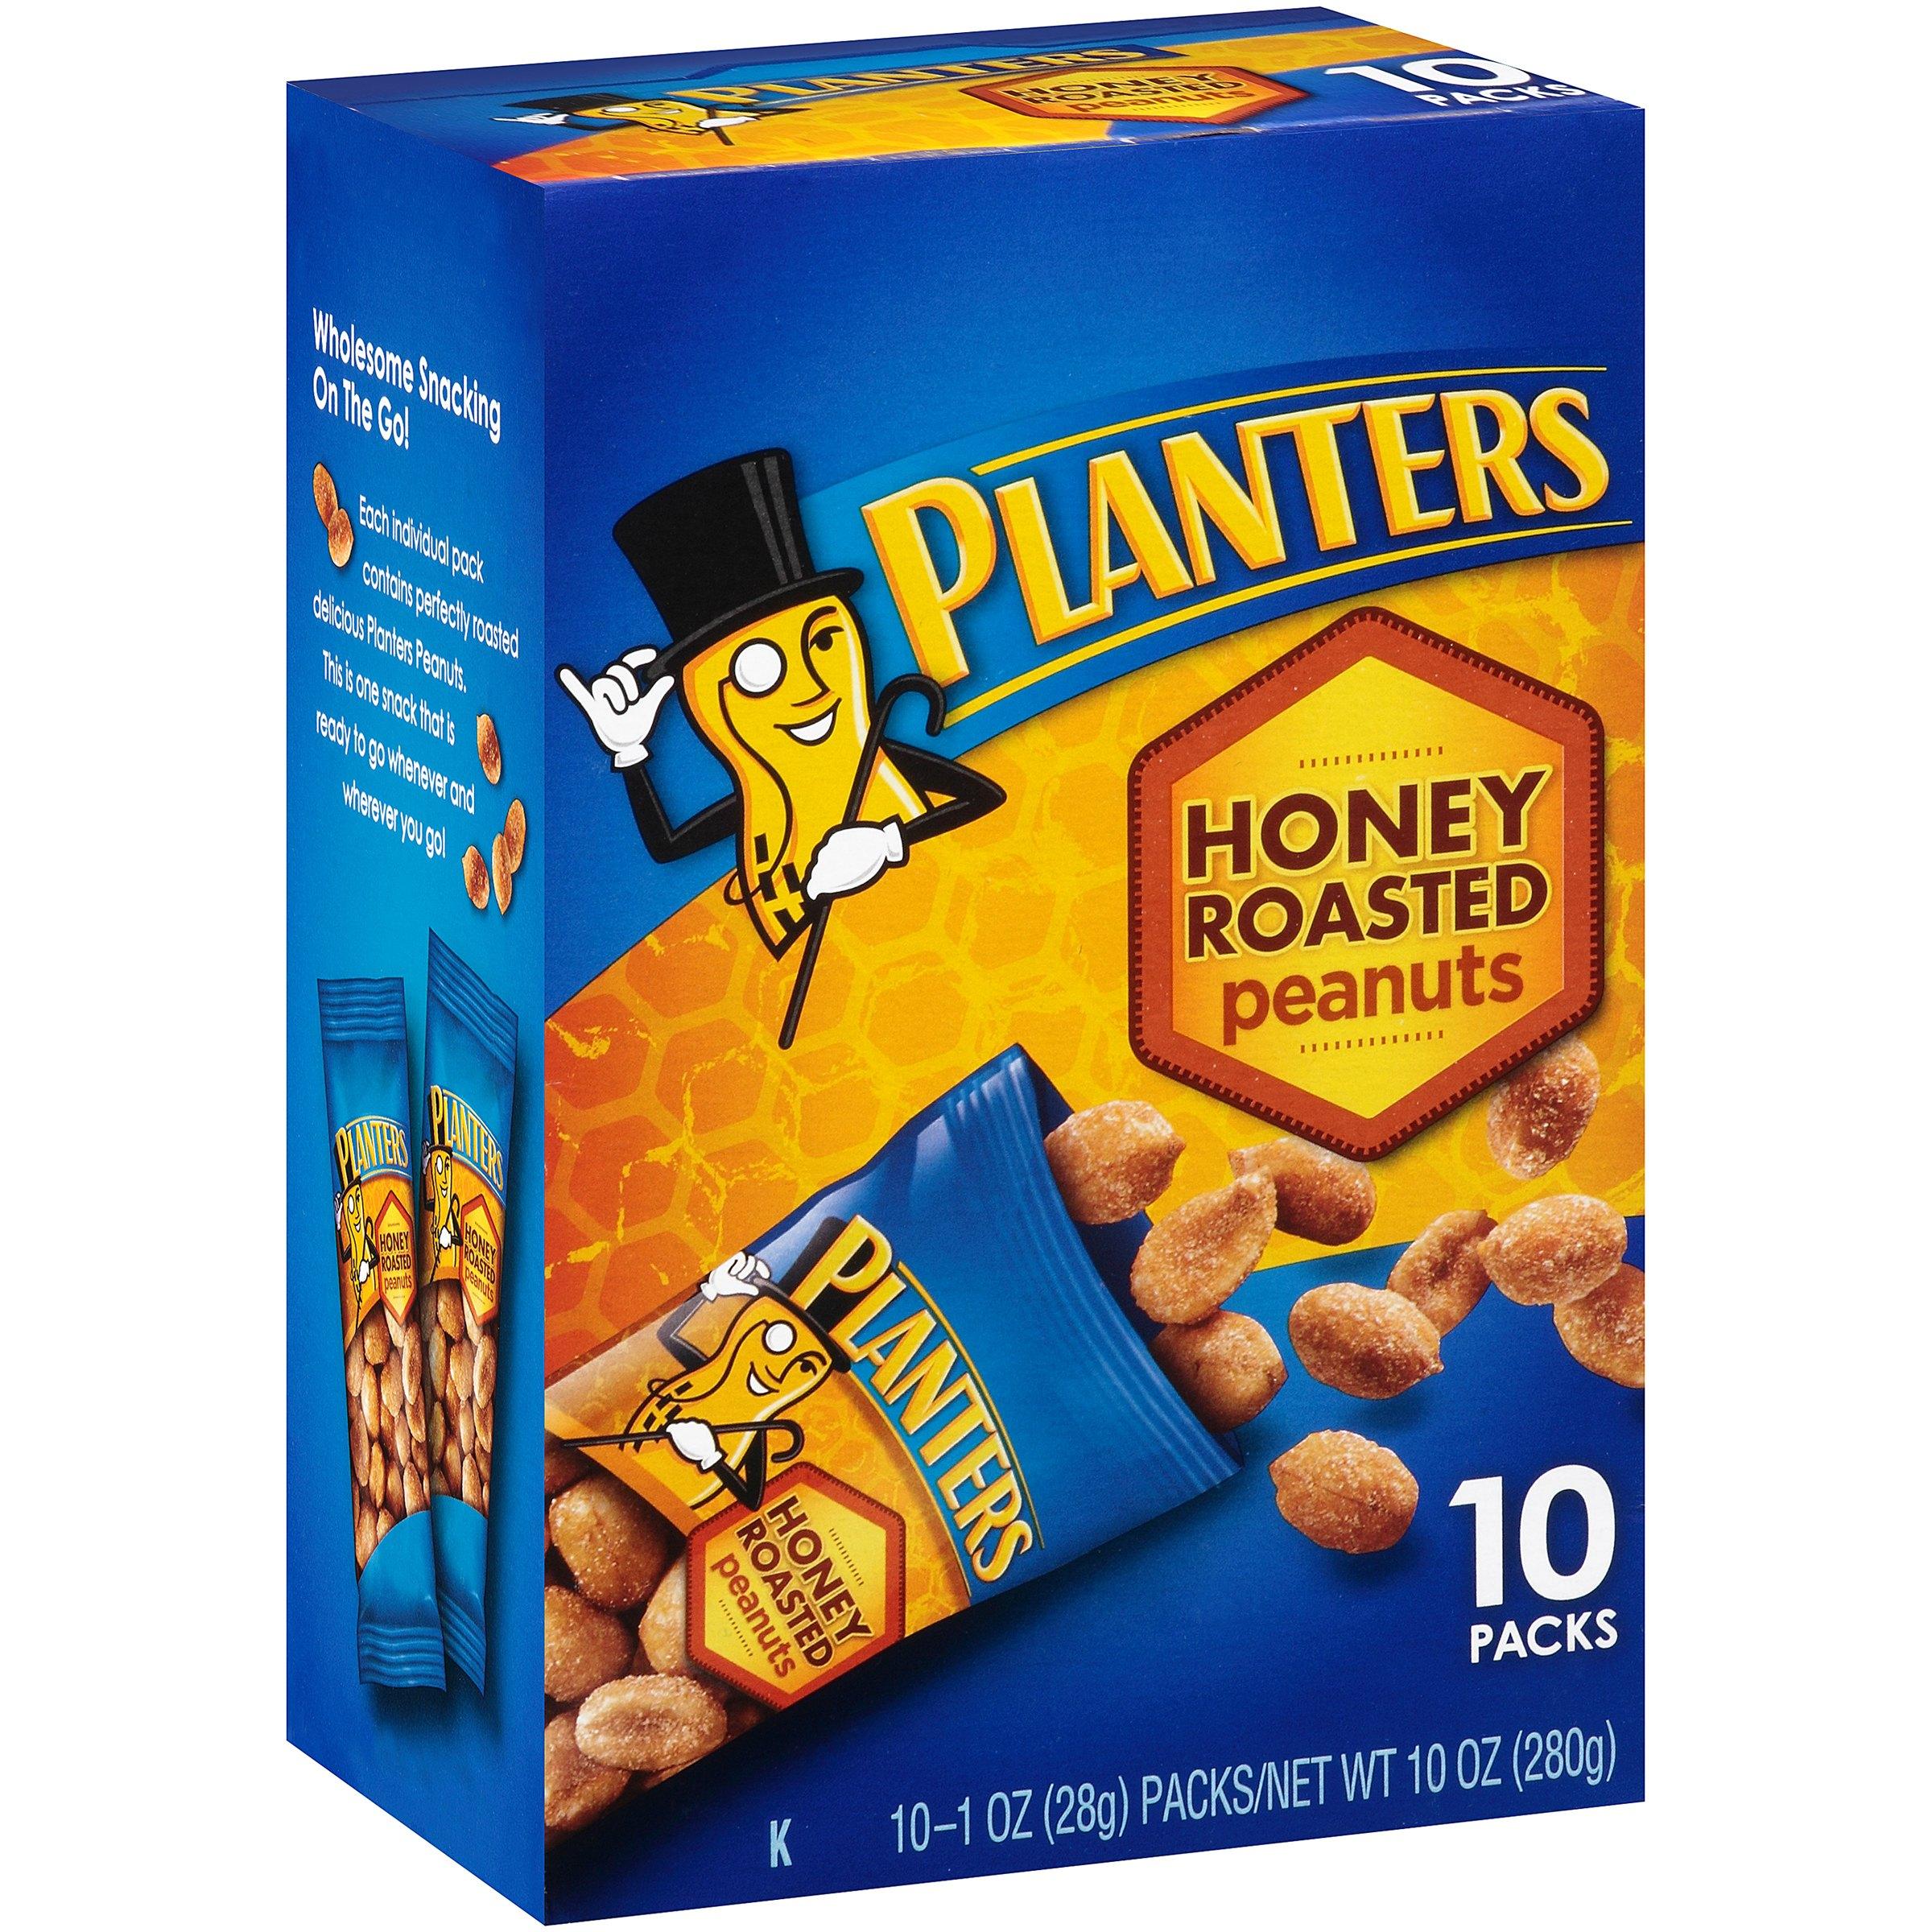 Planters Honey Roasted Peanuts 10-1 oz. Bags